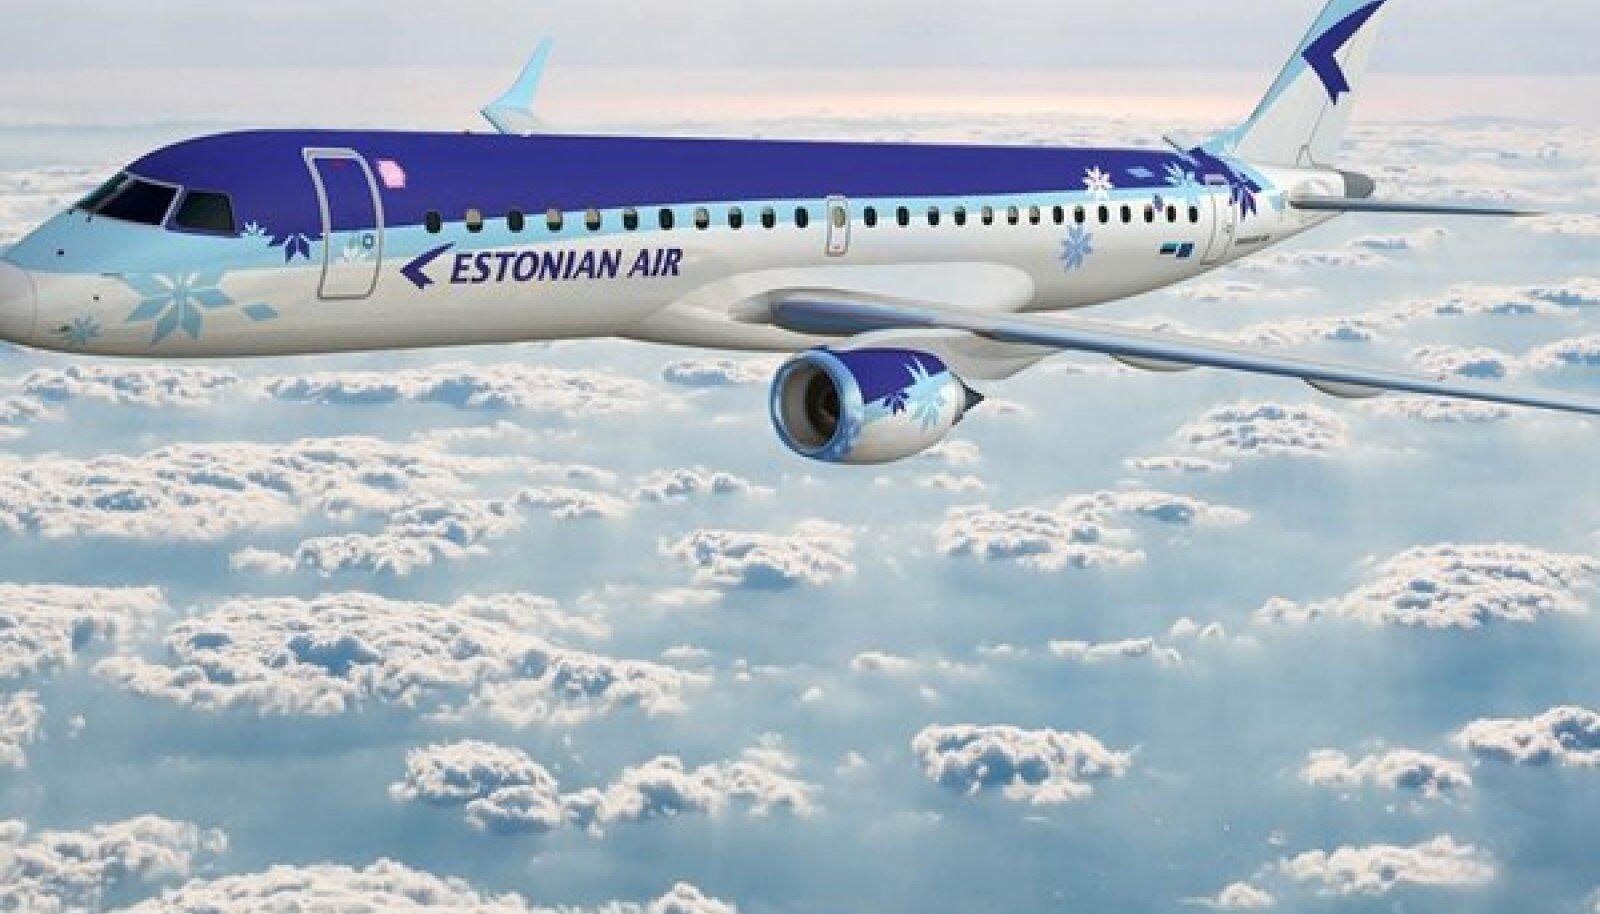 Estonian Air Embraer 190